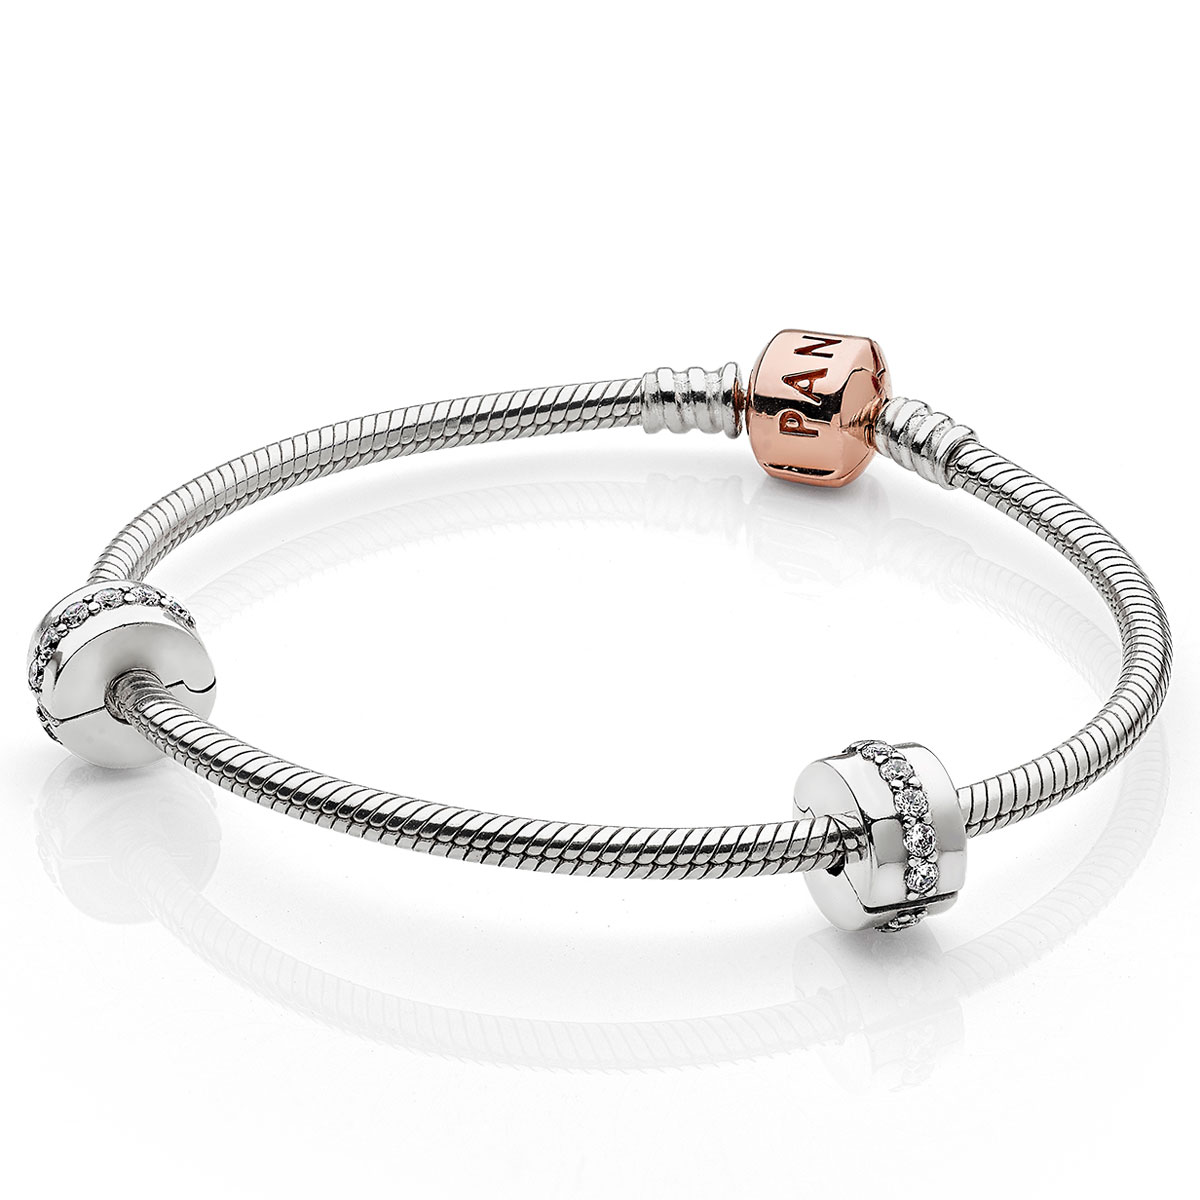 Pandora Starter Bracelet With Charms | IUCN Water